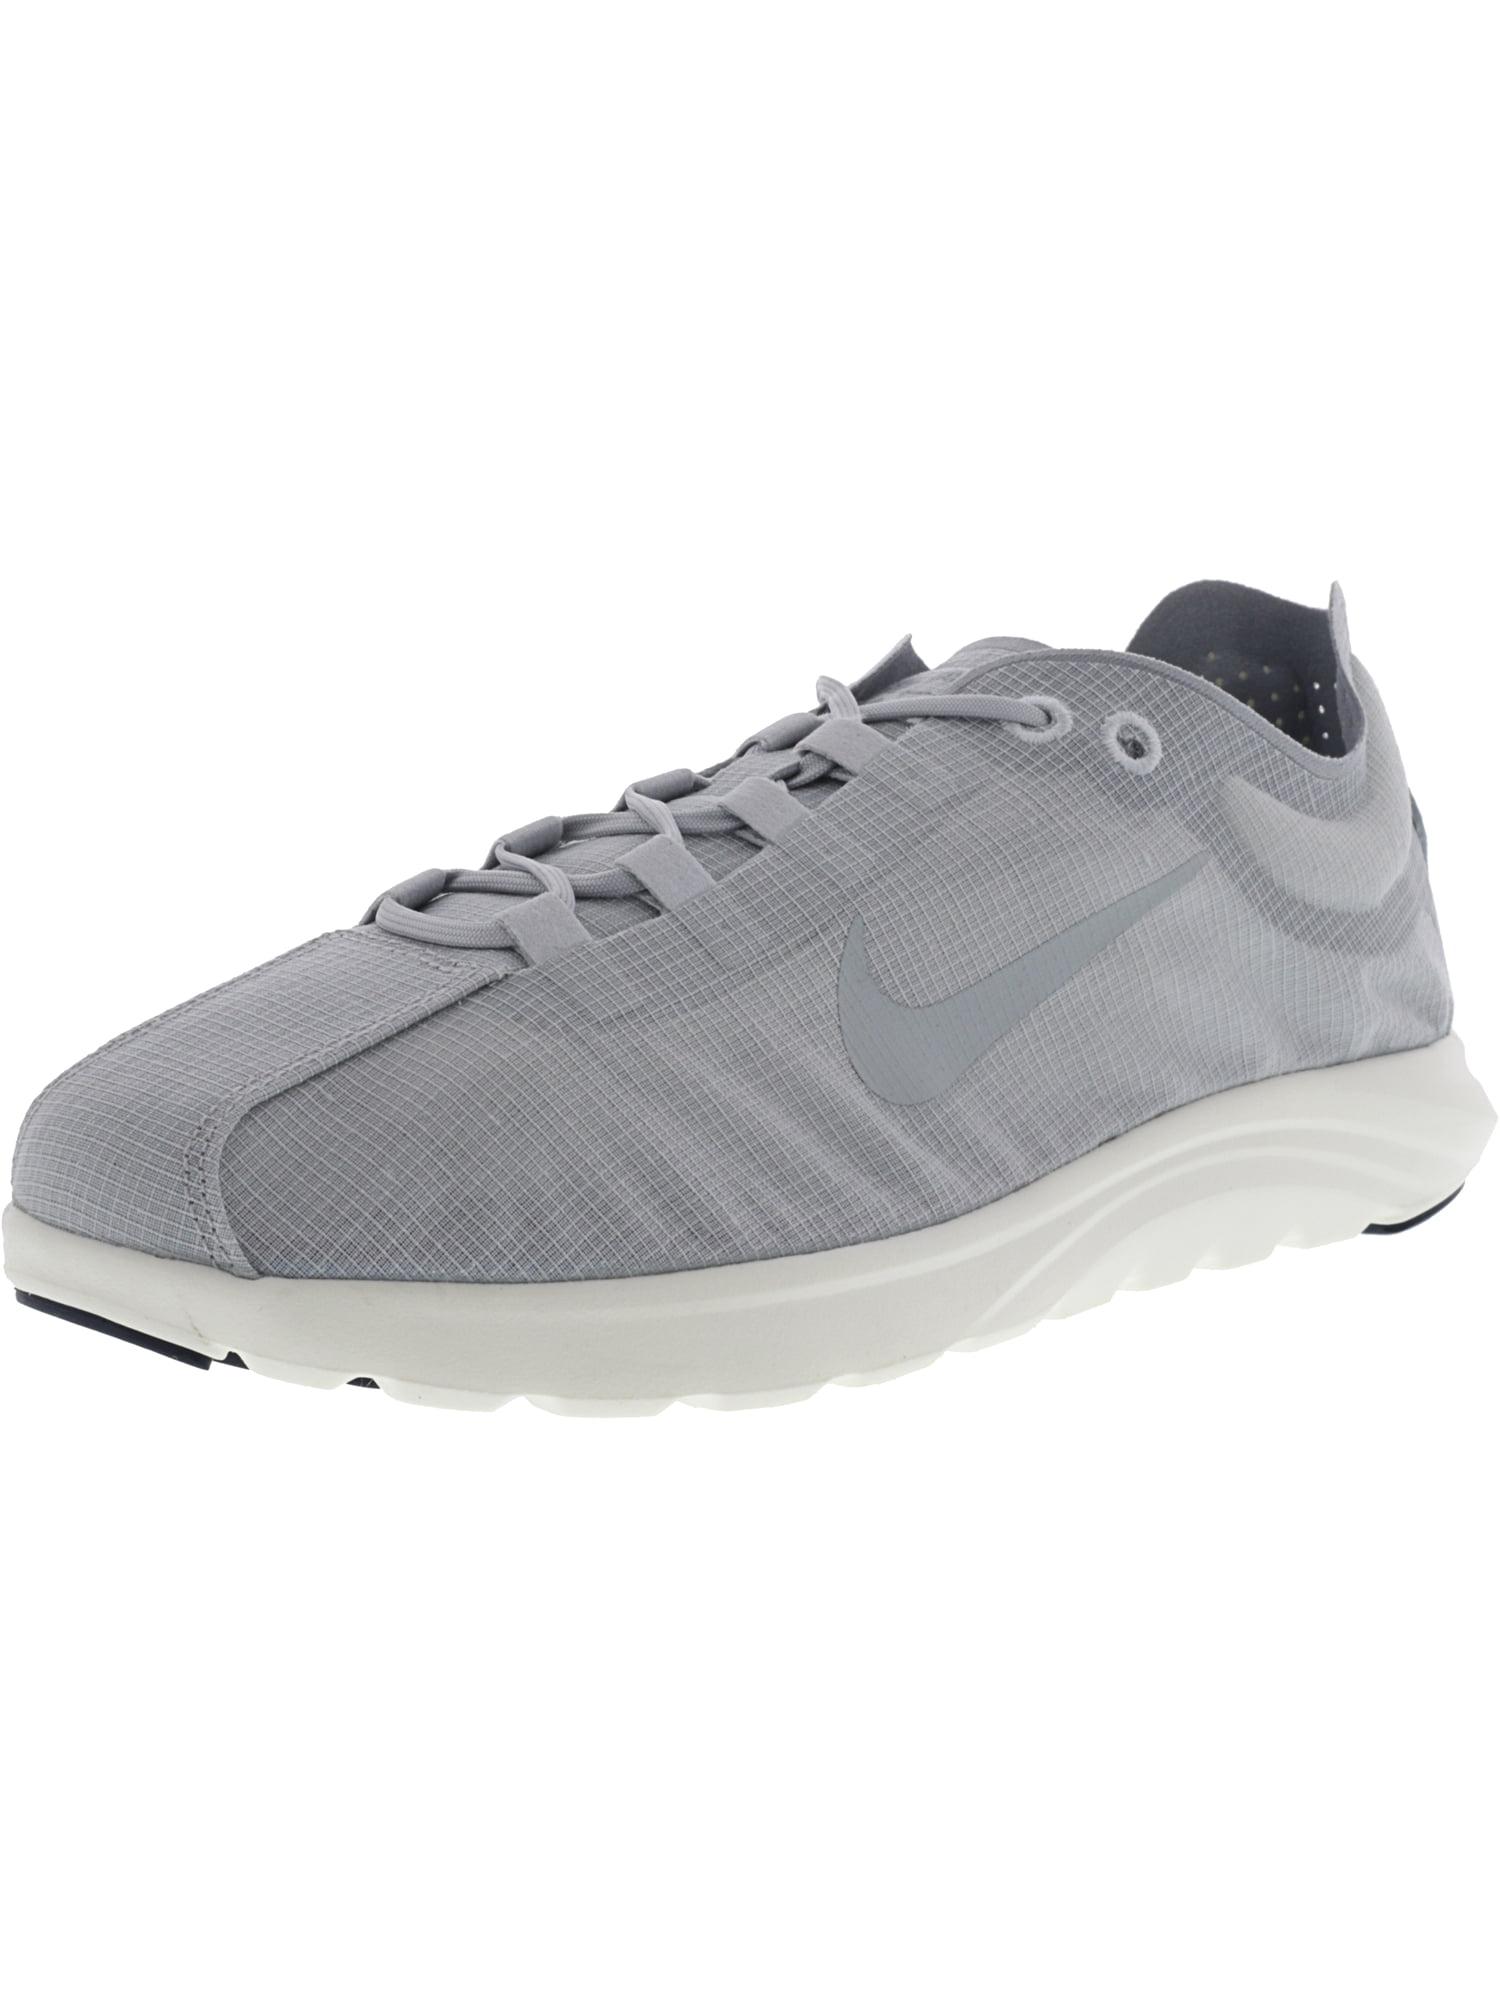 Nike Women's Mayfly Lite Pinnacle Pure Platinum / Wolf Grey Ankle-High Nylon Running Shoe - 8.5M